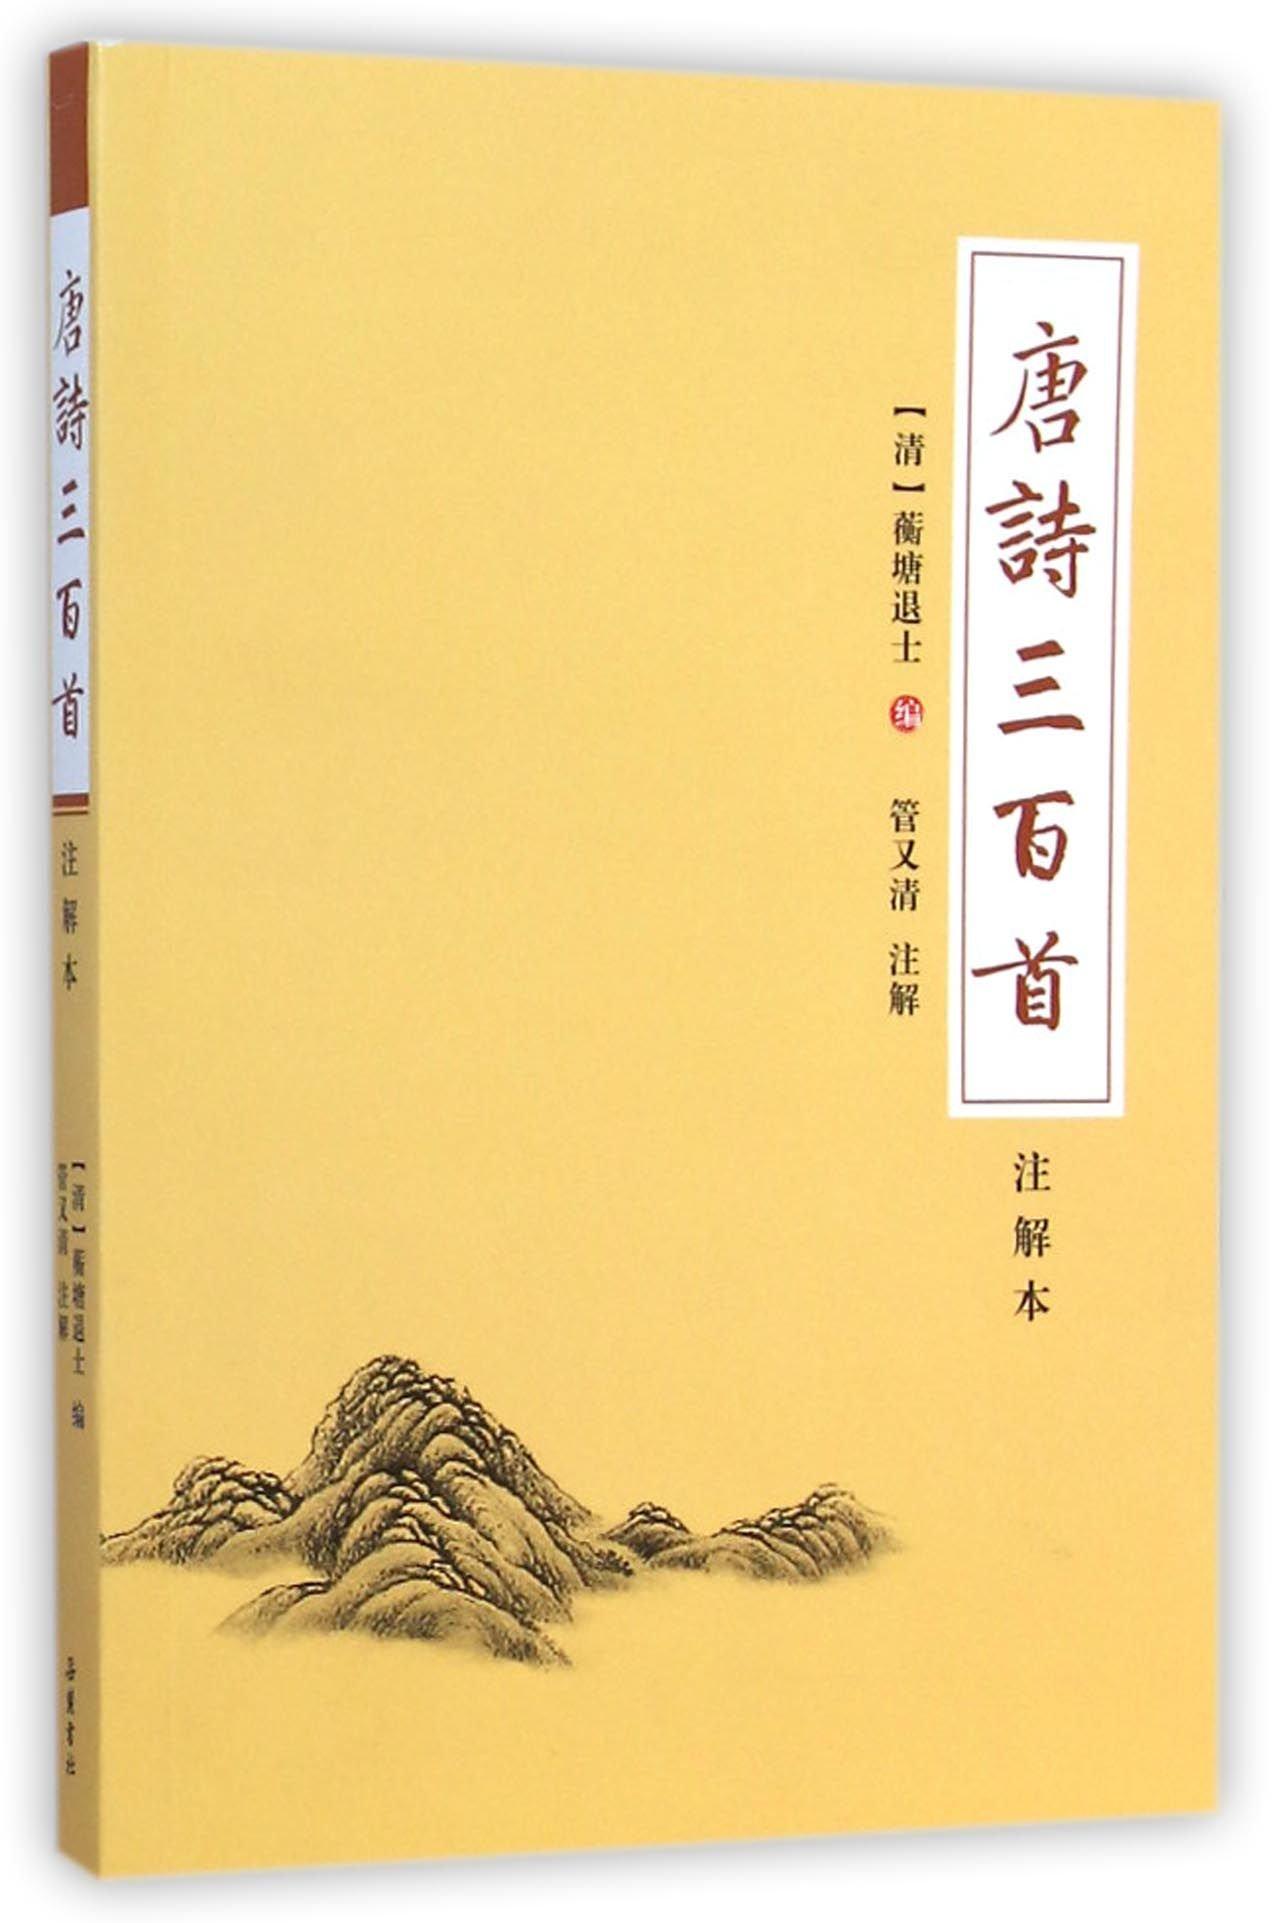 Three Hundred Tang Poems (Chinese Edition)